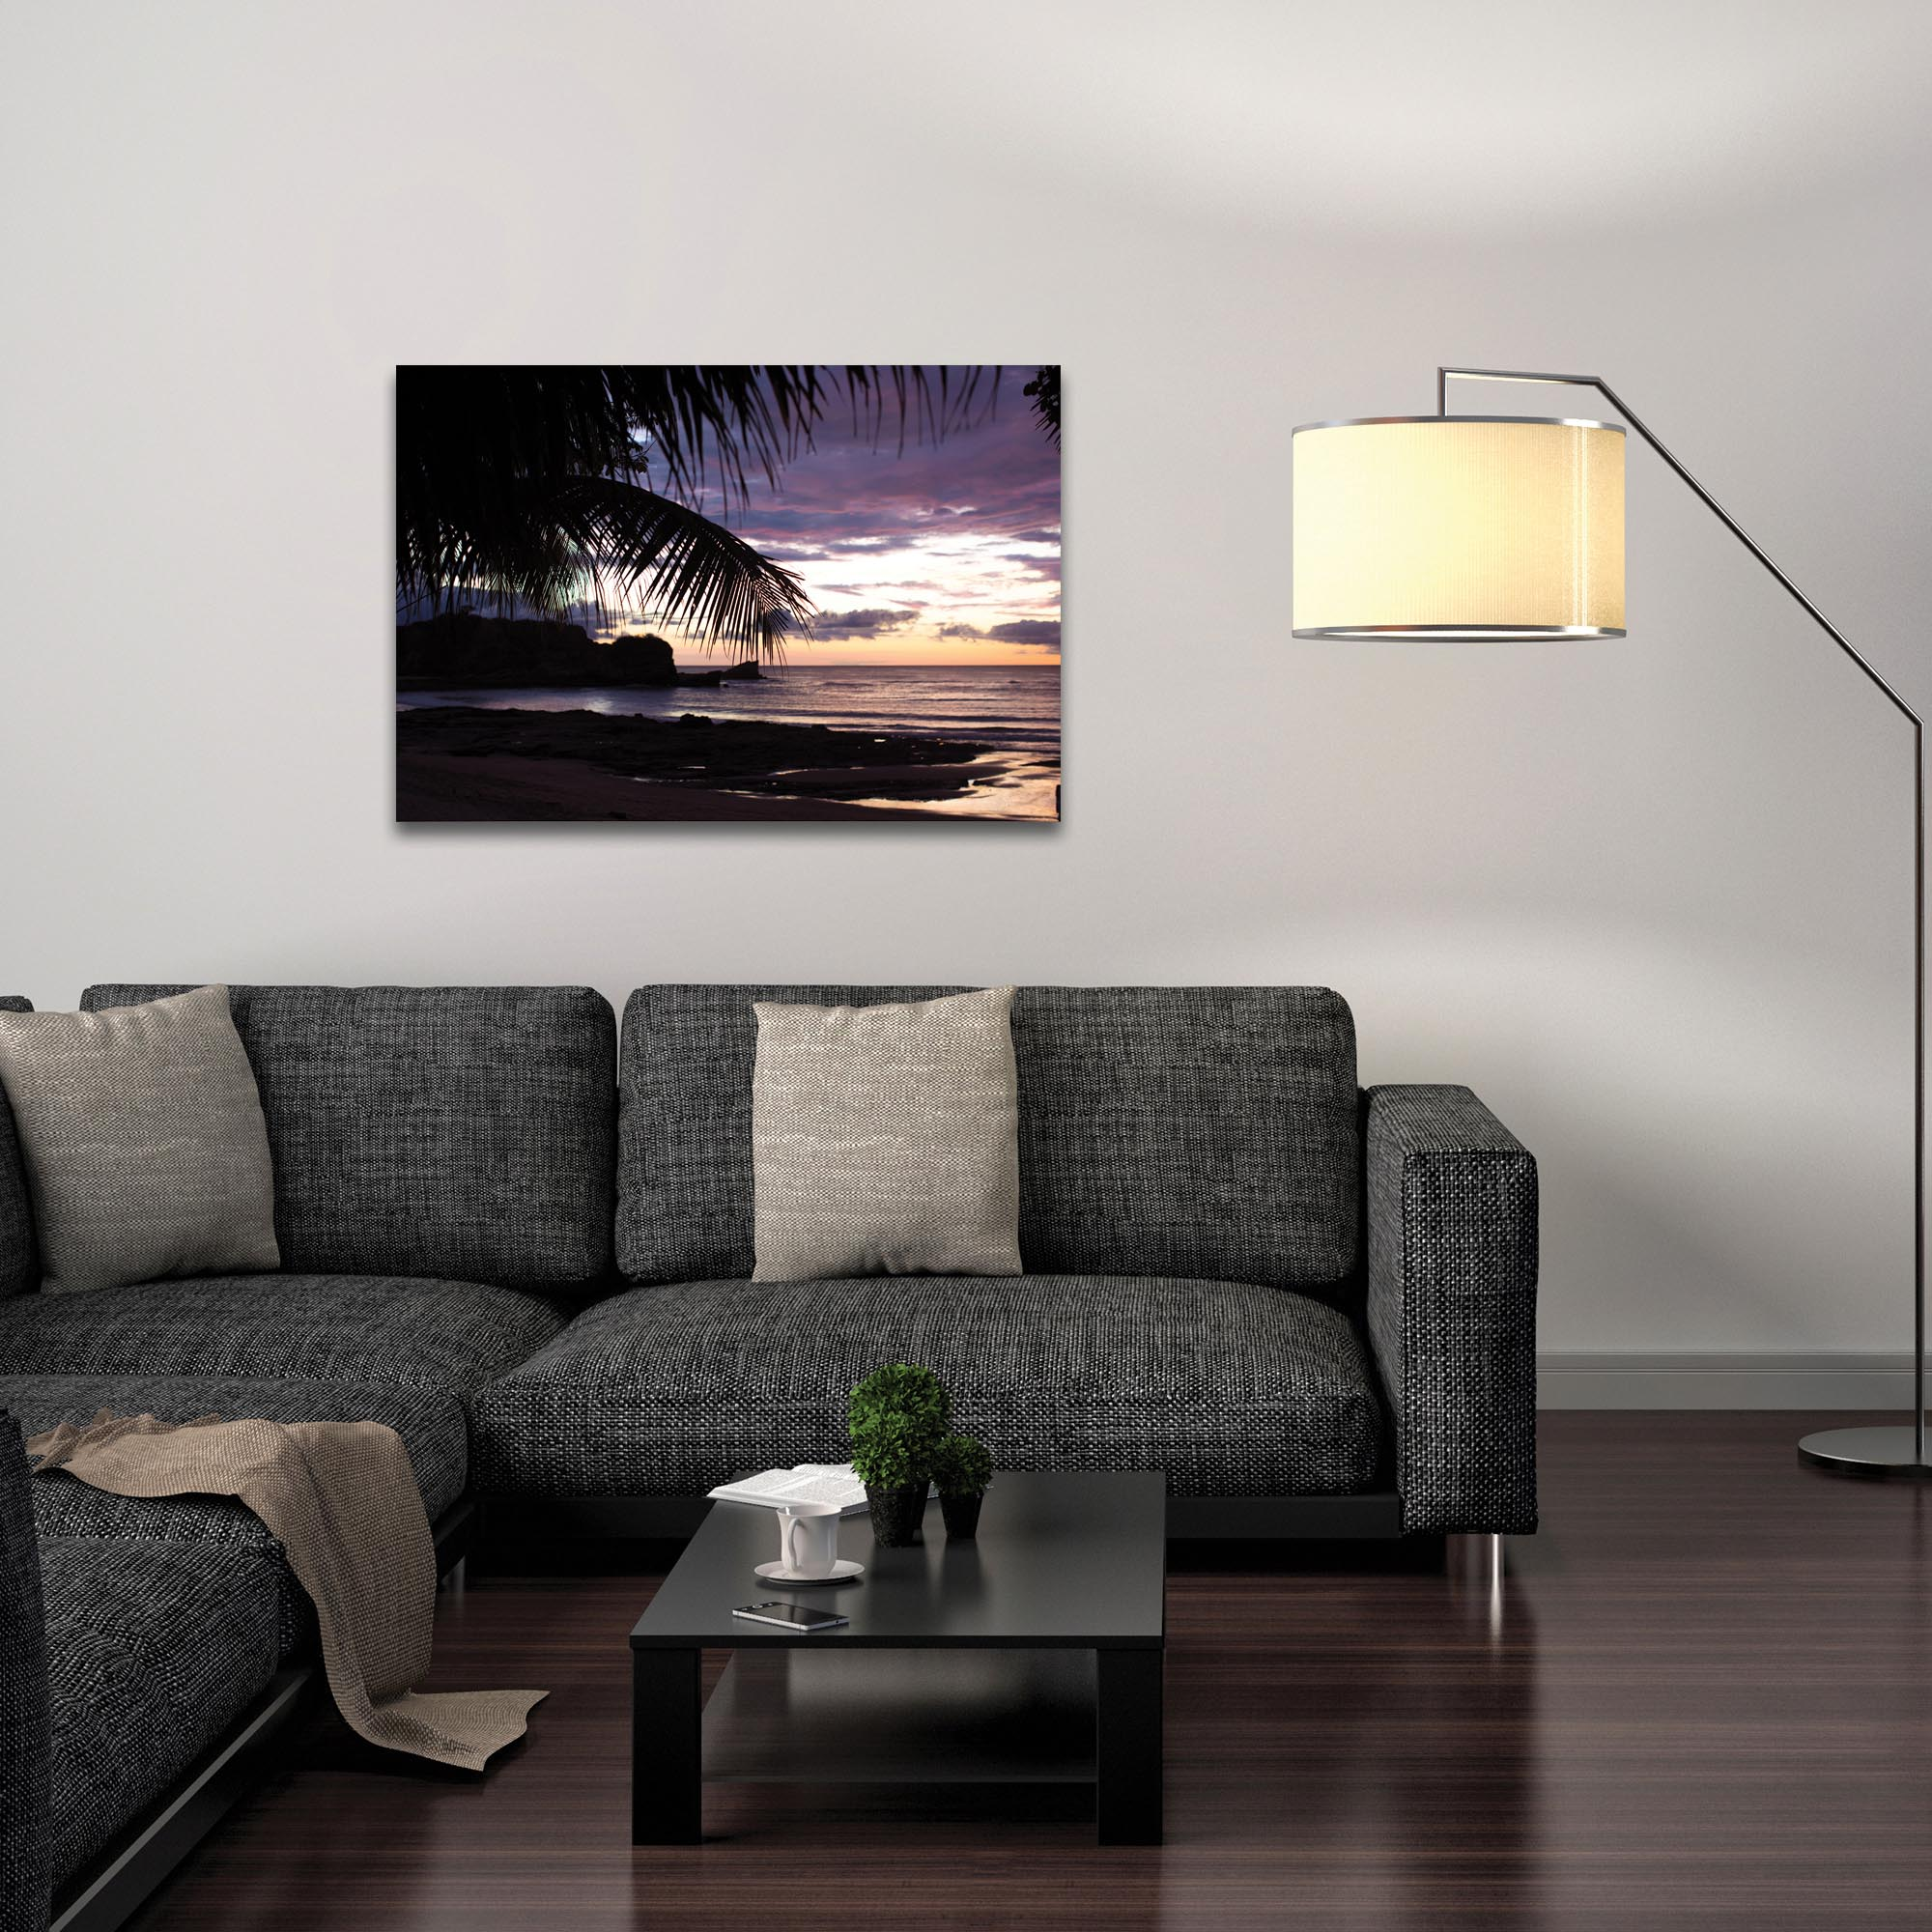 Coastal Wall Art 'Sunset Palms' - Beach Sunset Decor on Metal or Plexiglass - Lifestyle View